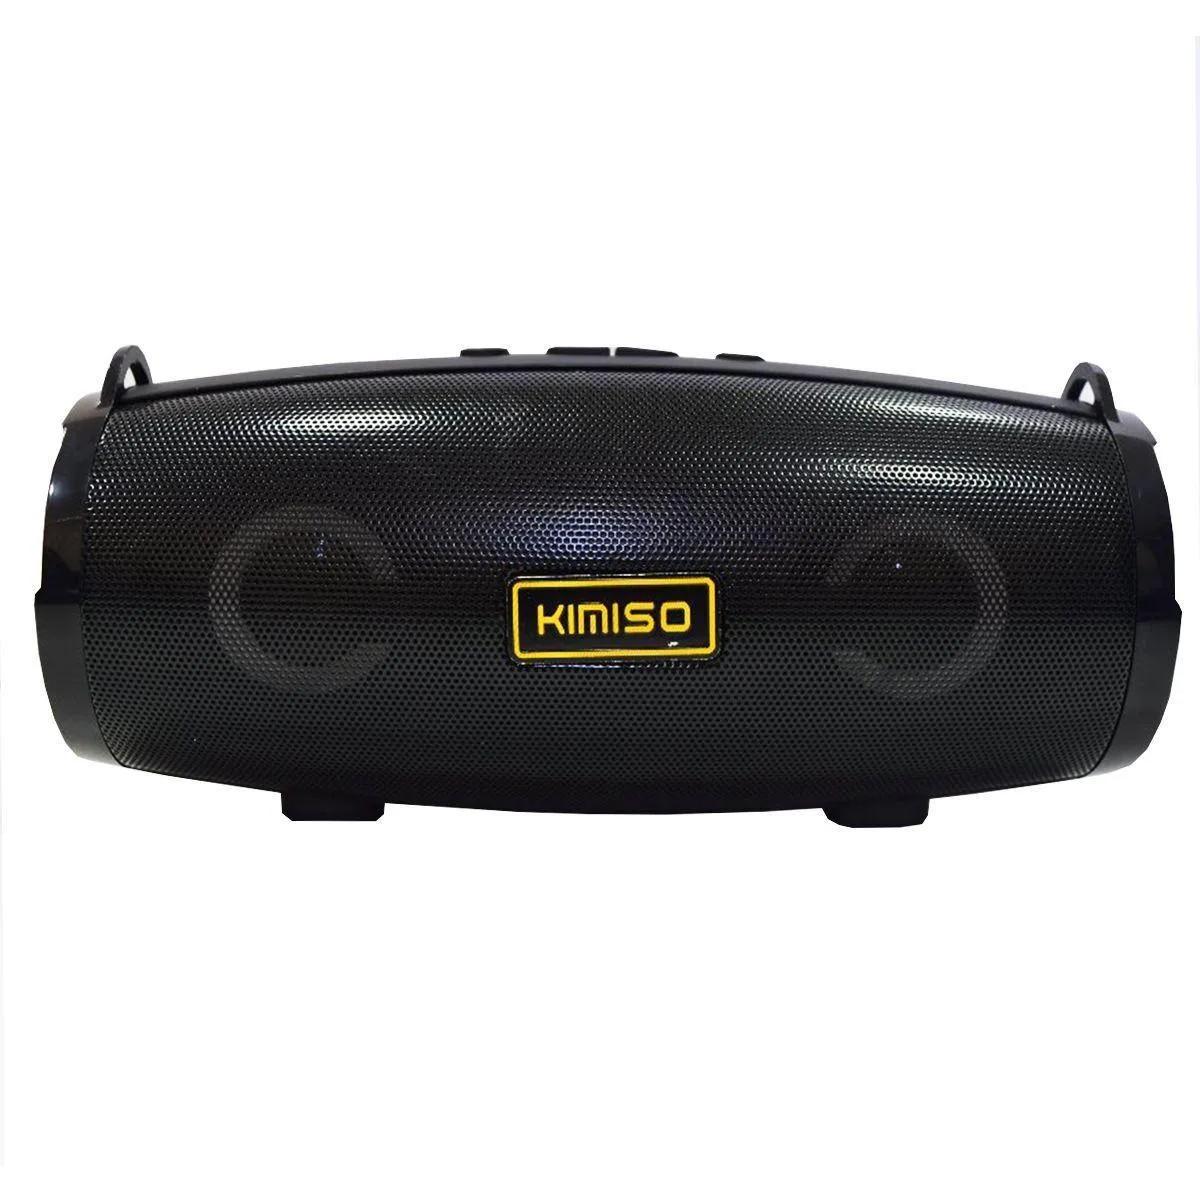 Caixa De Som Bluetooth Speaker Usb Sd Kimiso Kms-222